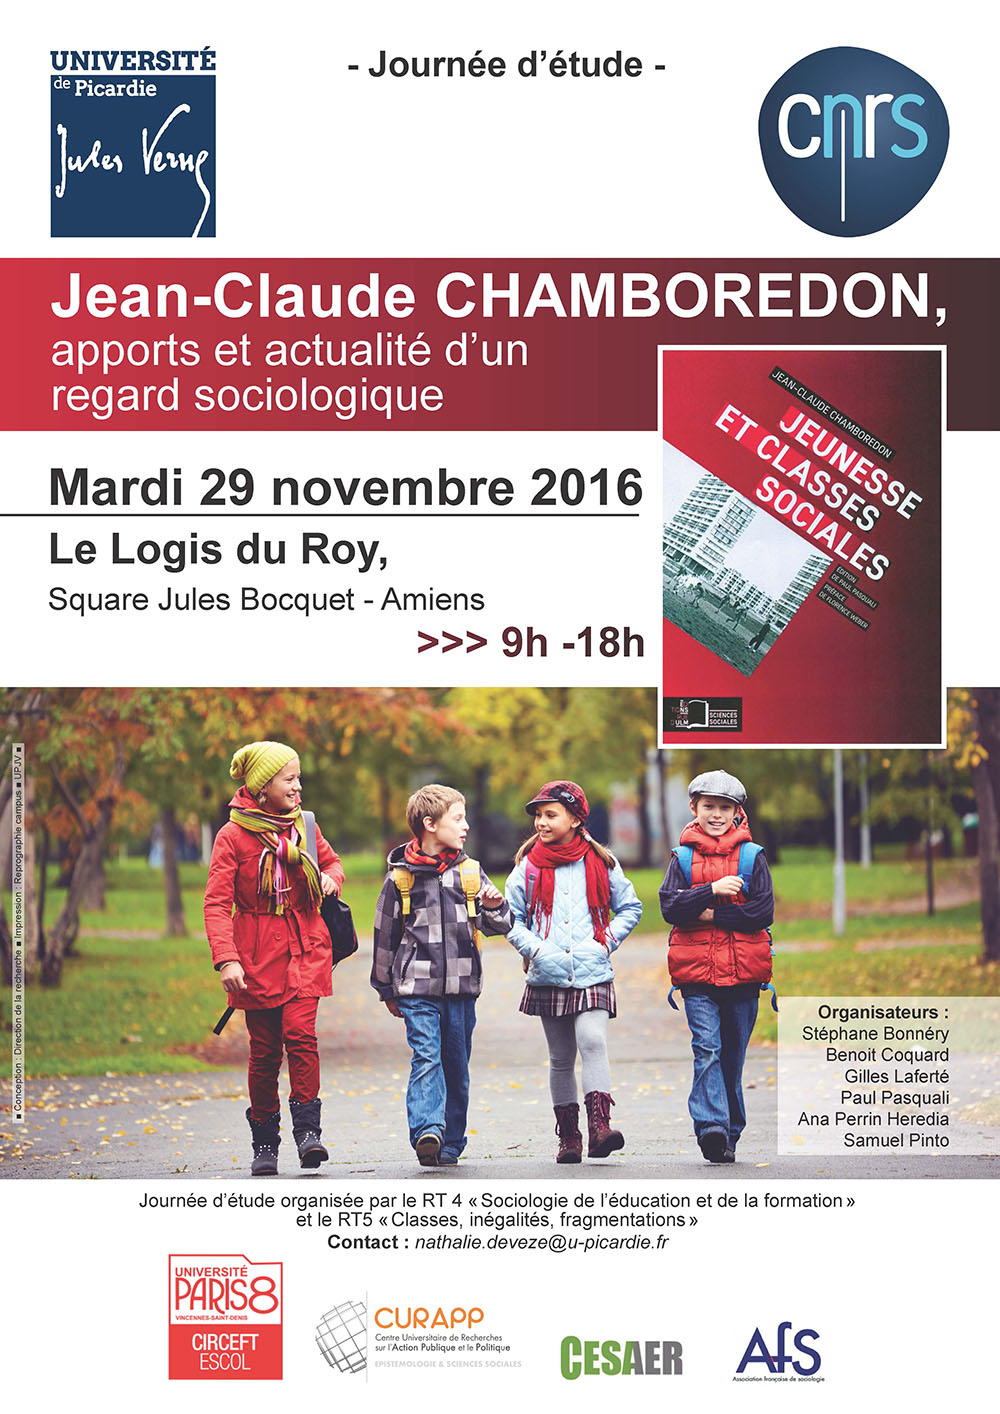 Chamboredon